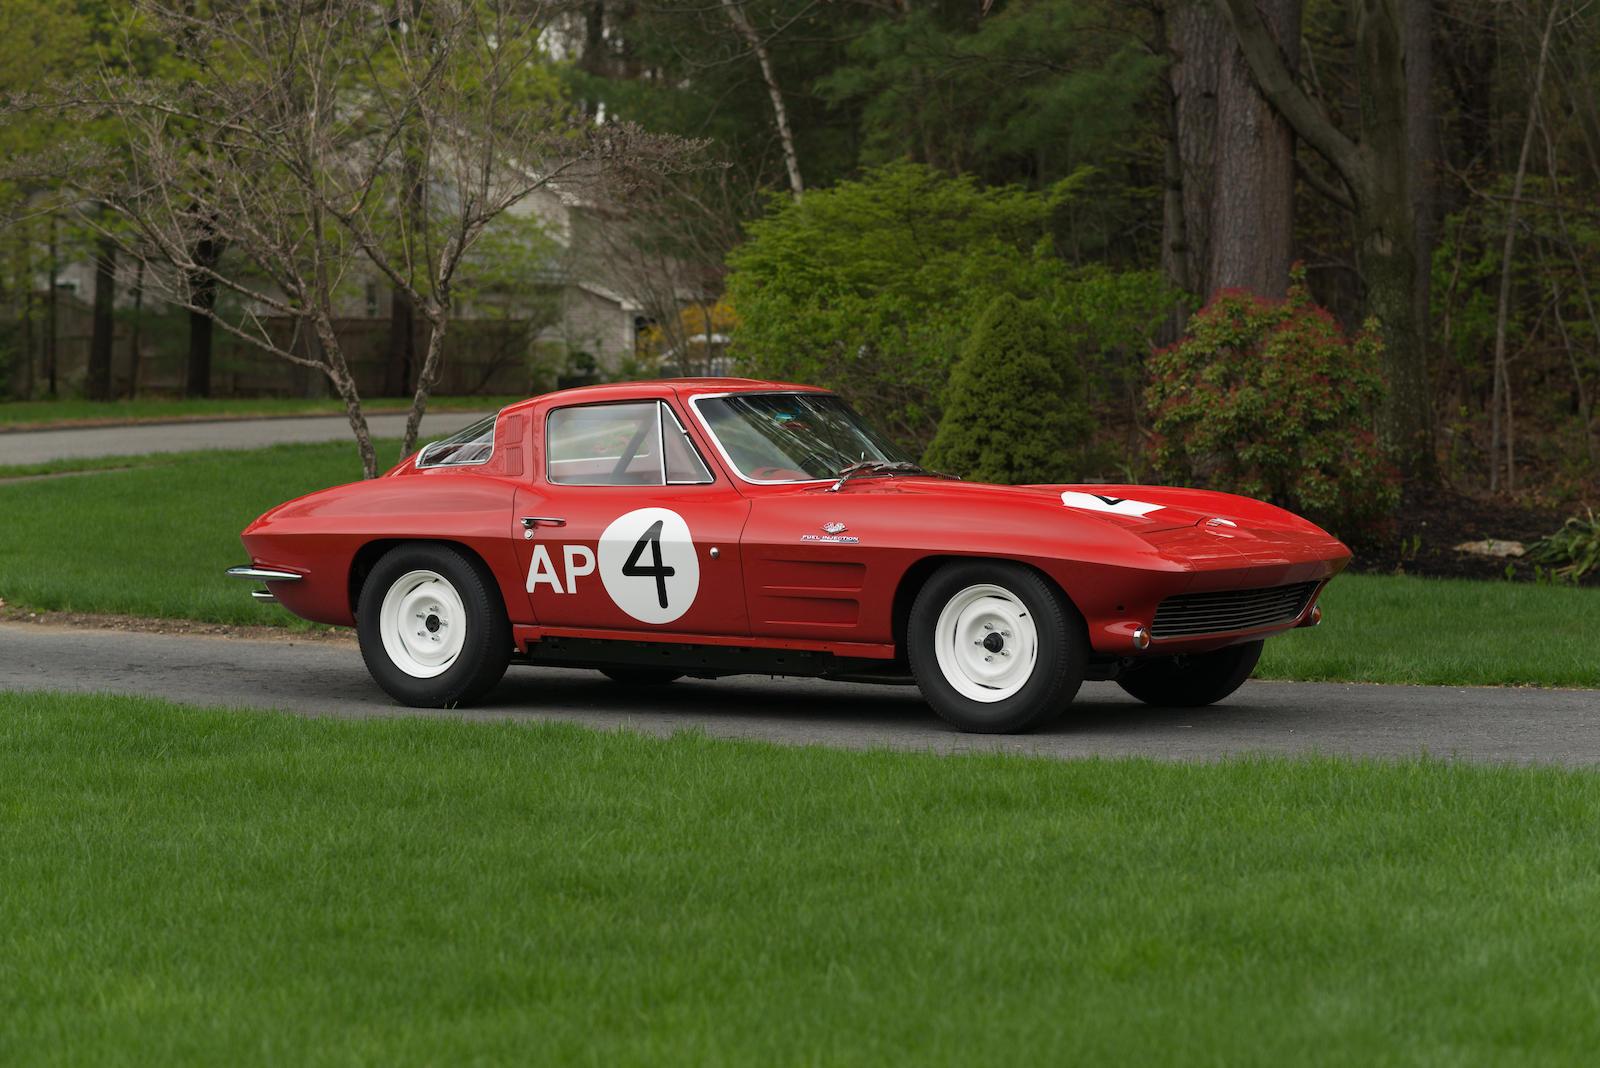 1964 Chevrolet Corvette Sting Ray 'Big Tank Fuelie'